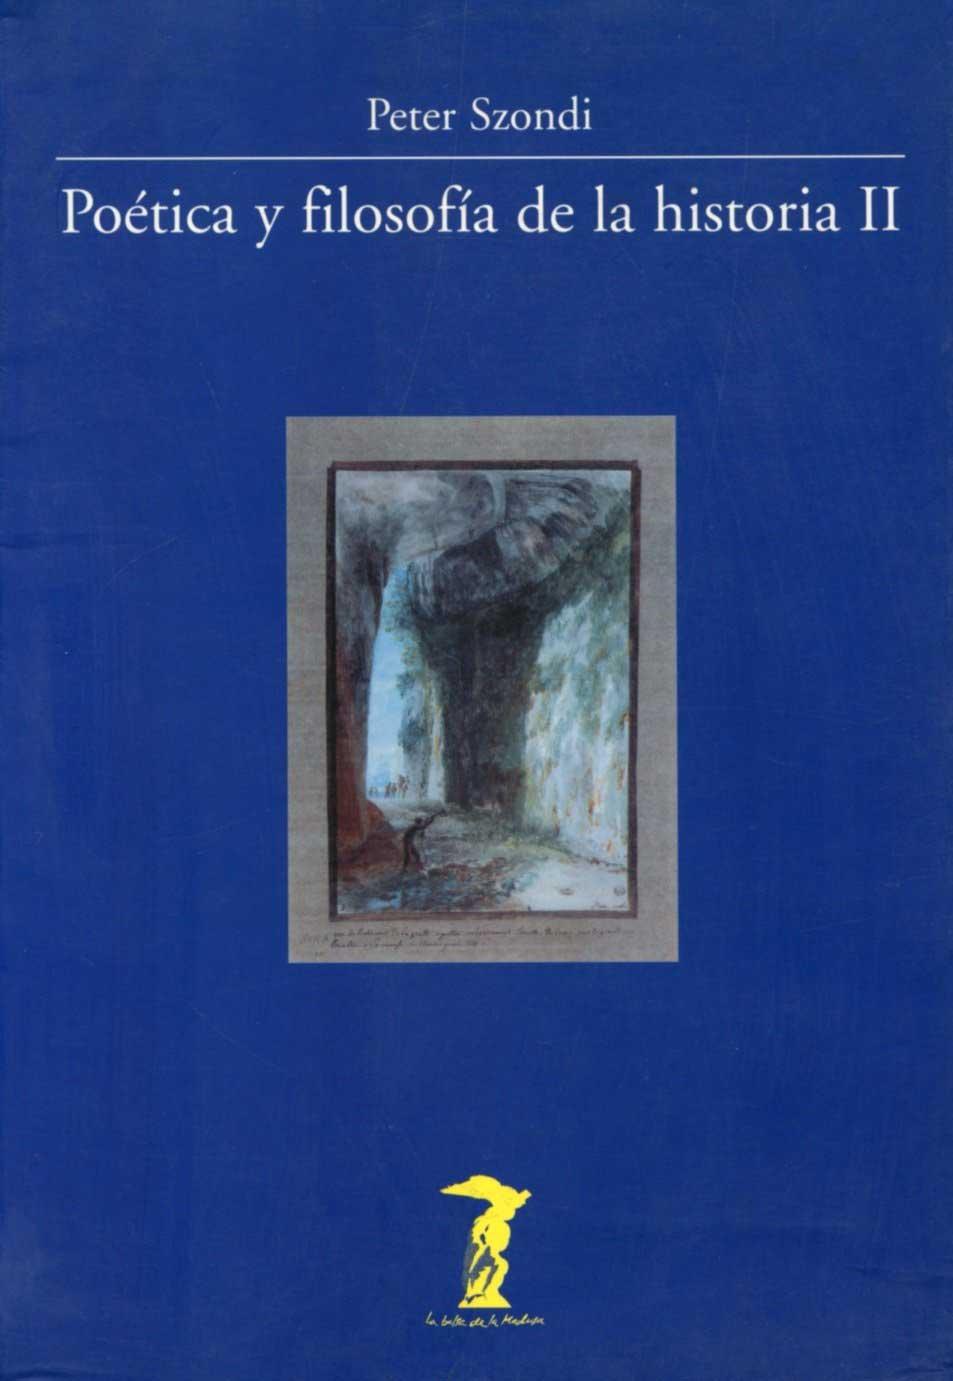 POETICA Y FILOSOFIA DE LA HISTORIA II